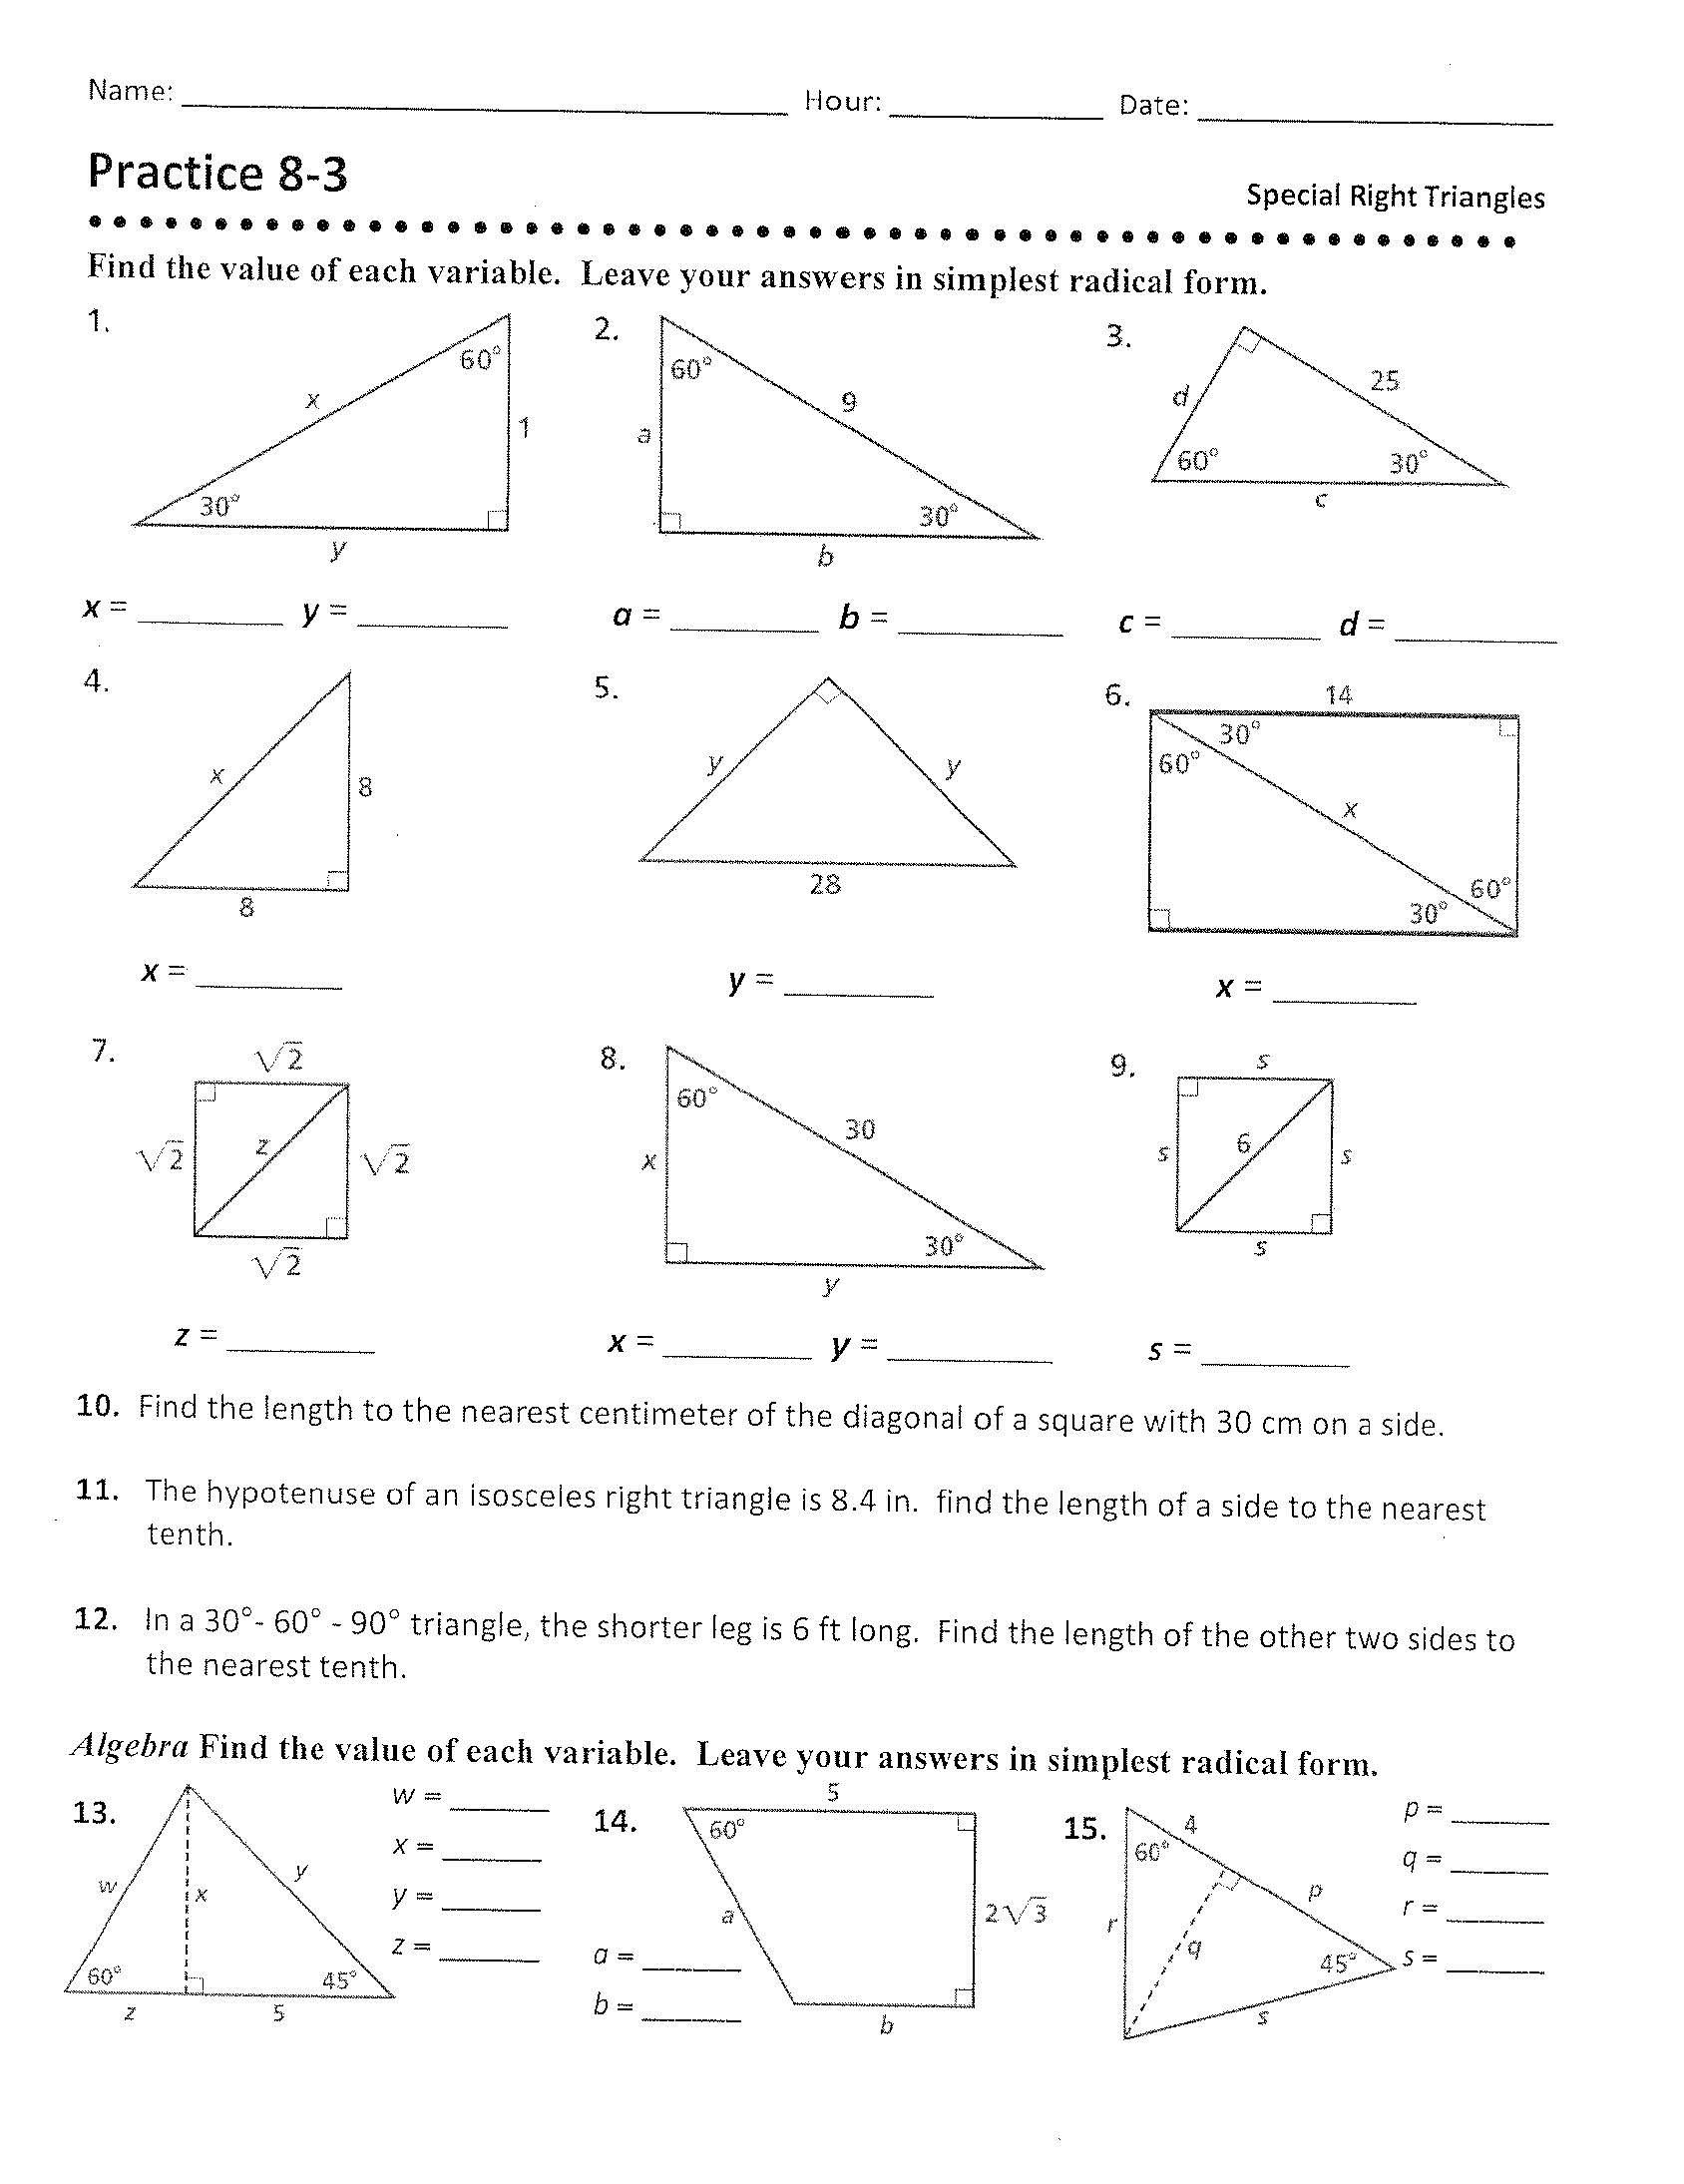 30 60 90 Triangles Worksheet